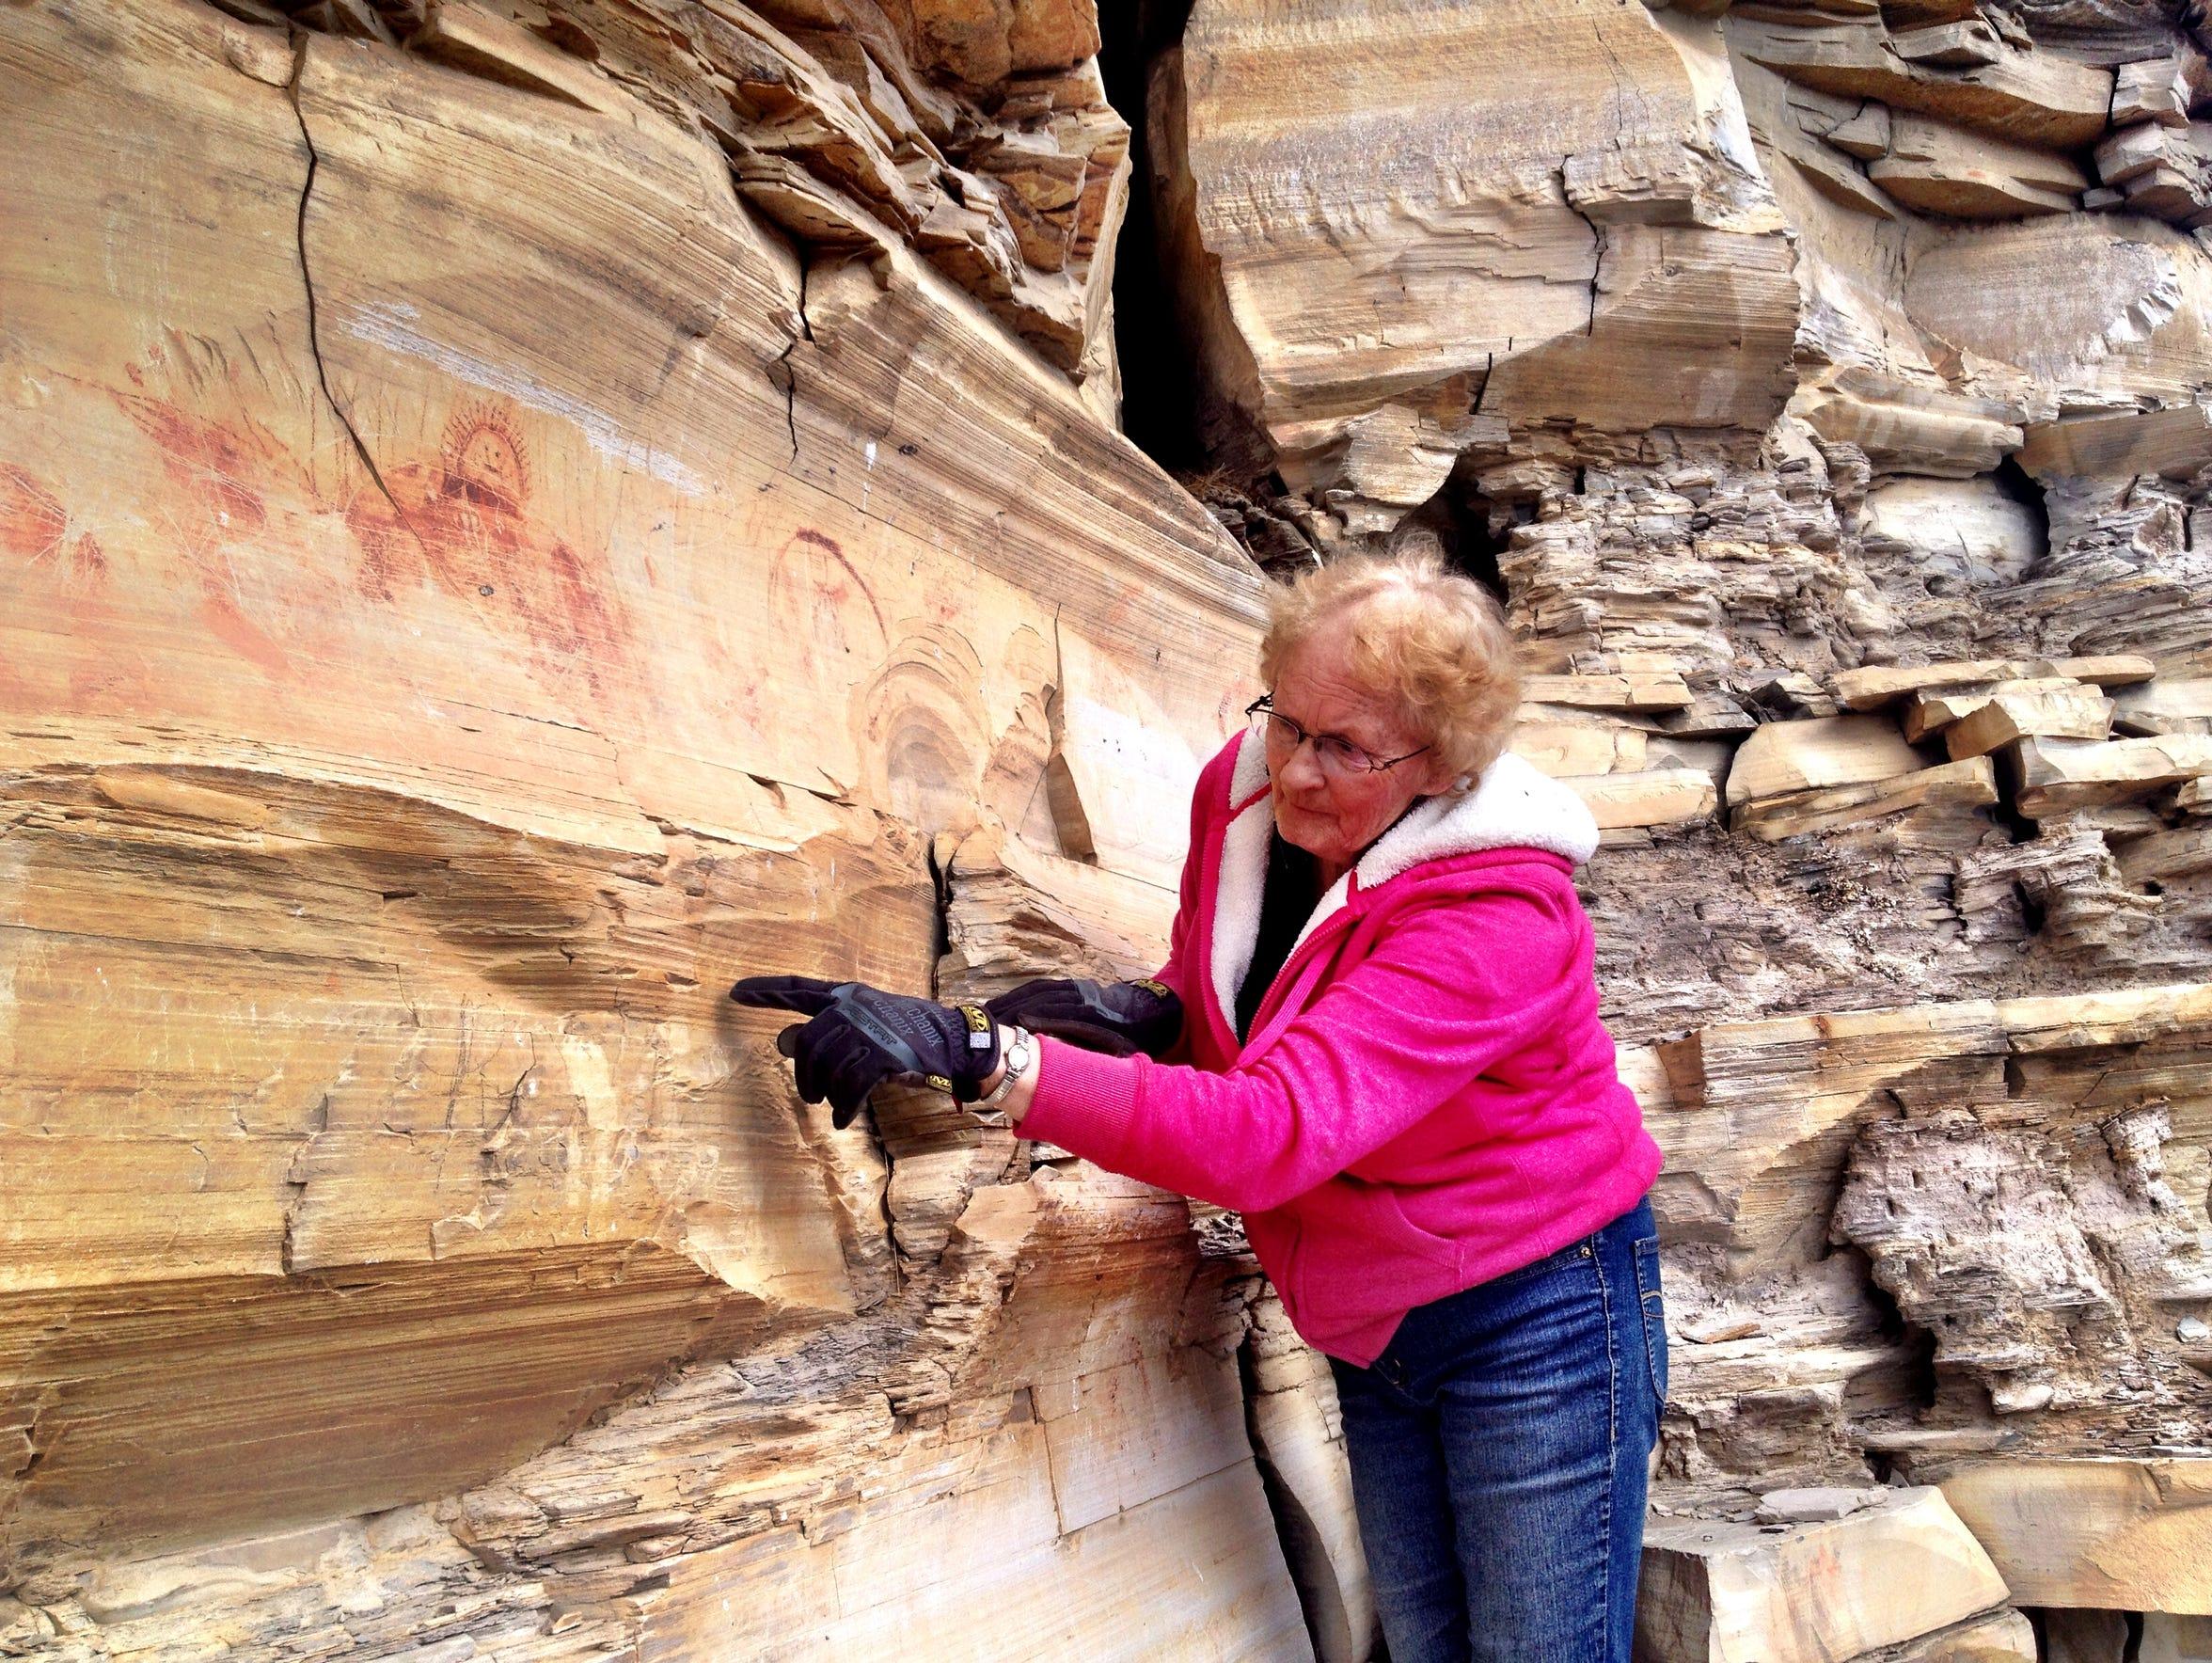 Macie Ahlgren of Bear Gulch Pictographs